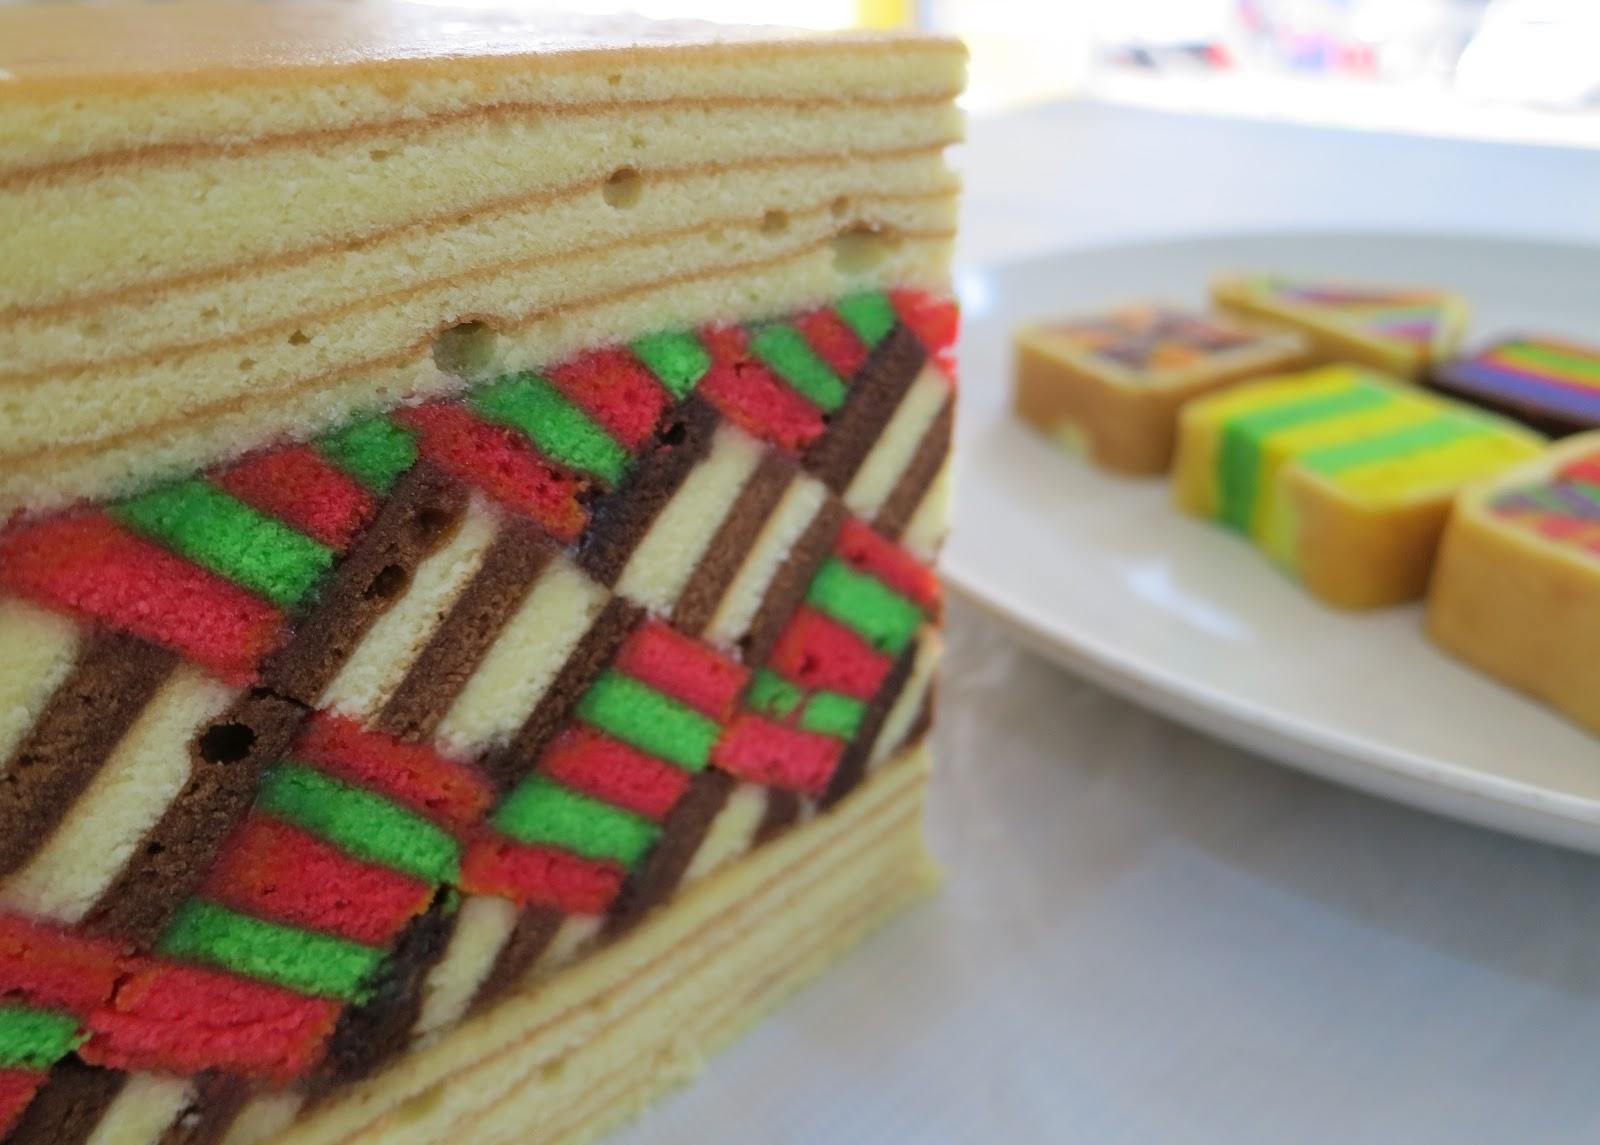 sarawak cake - photo #7